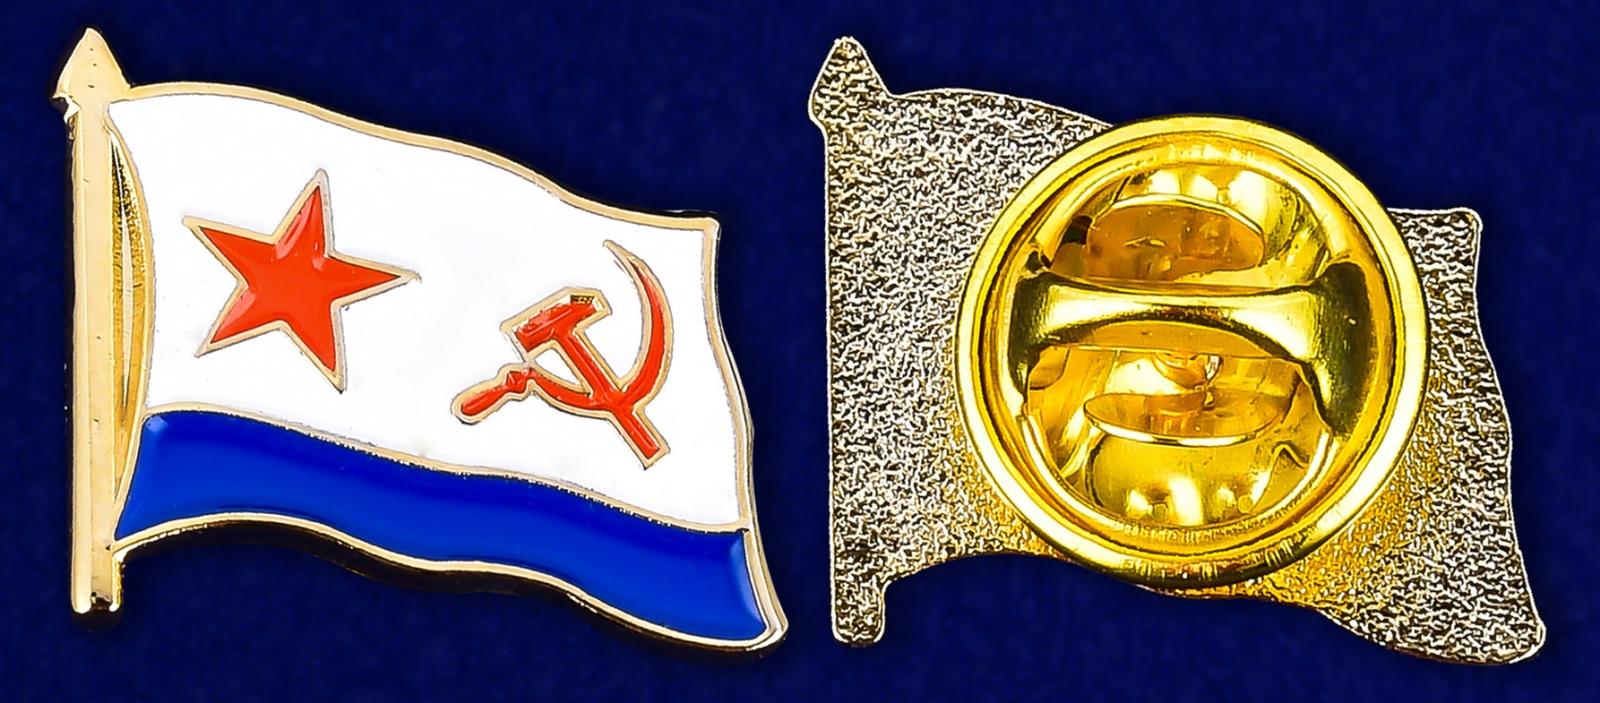 Значок ВМФ СССР - аверс и реверс